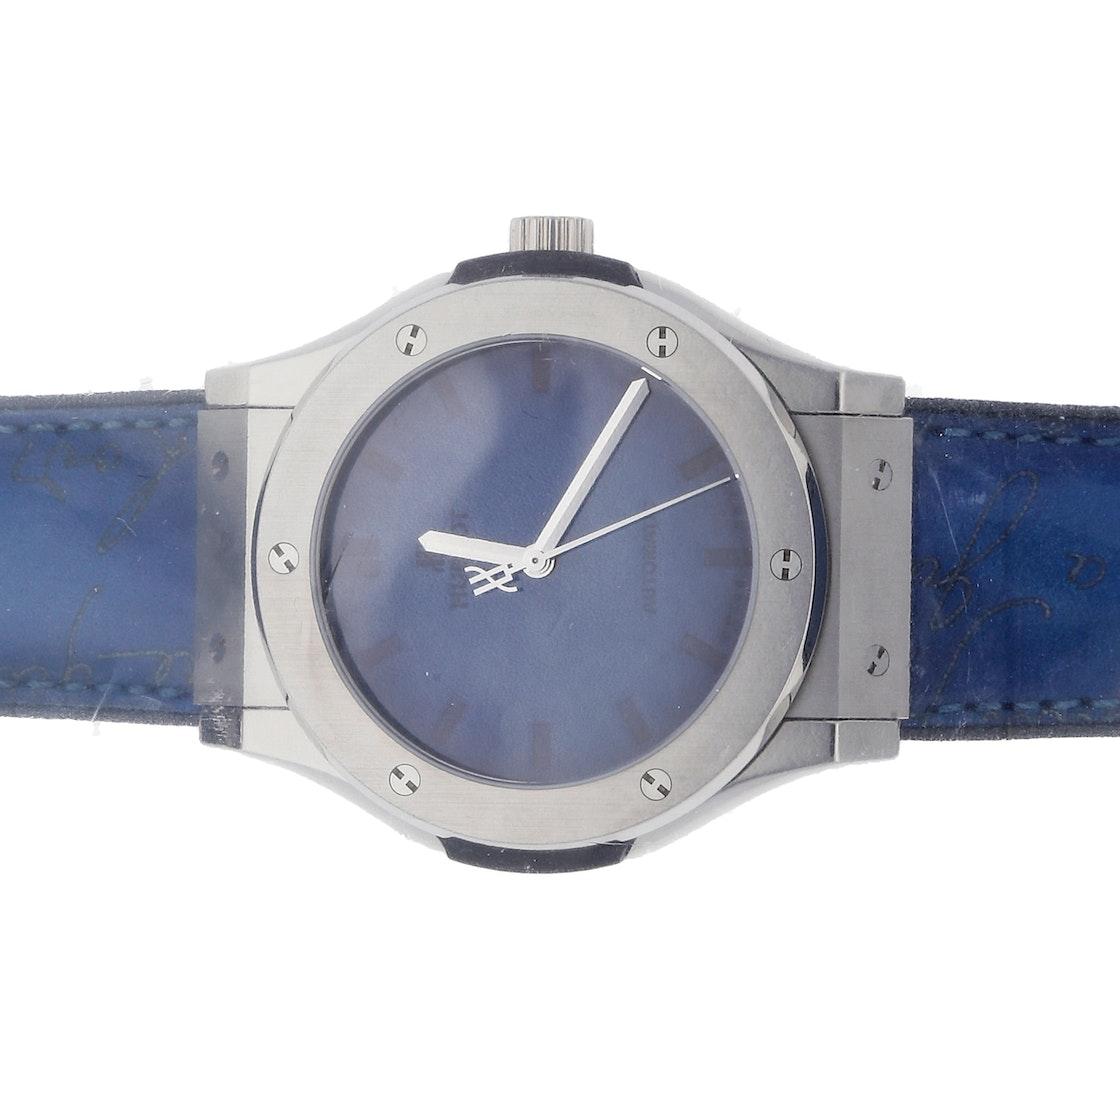 Hublot Classic Fushion Berluti Blue Limited Edition 511.NX.050B.VR.BER16